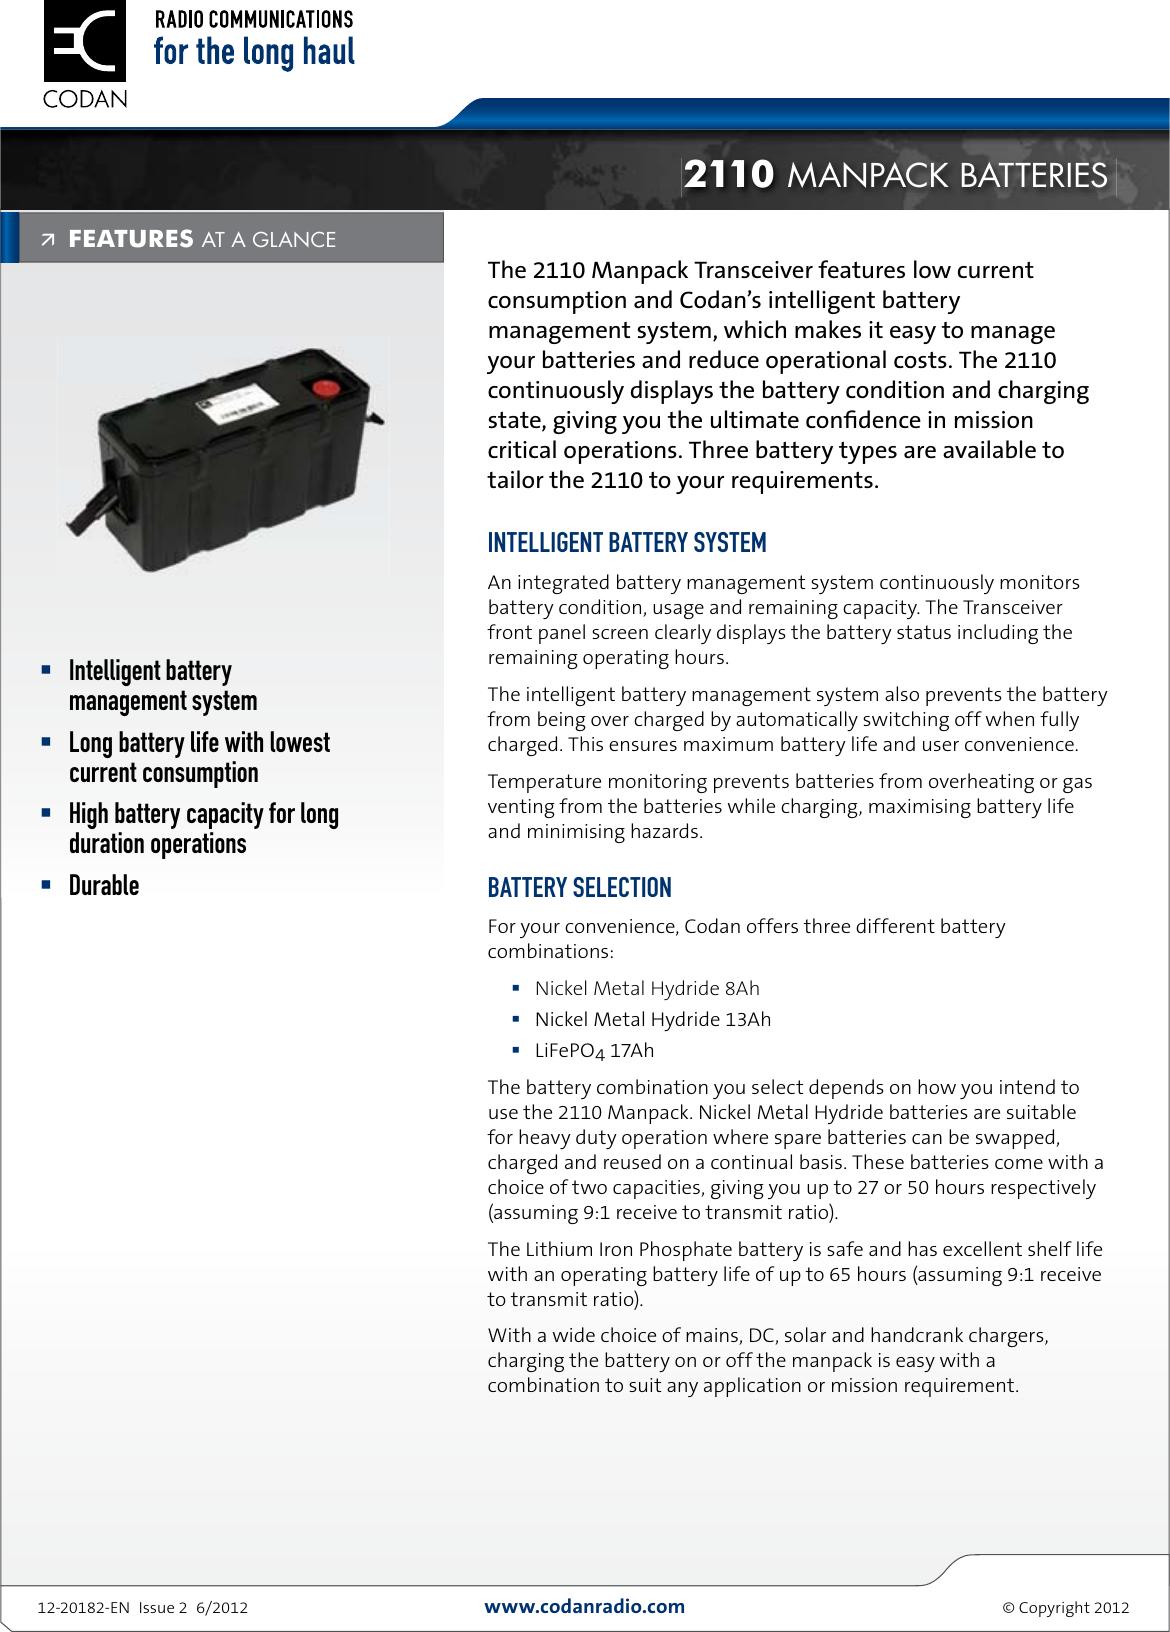 Codan Patrol 2110 Manpack Batteries